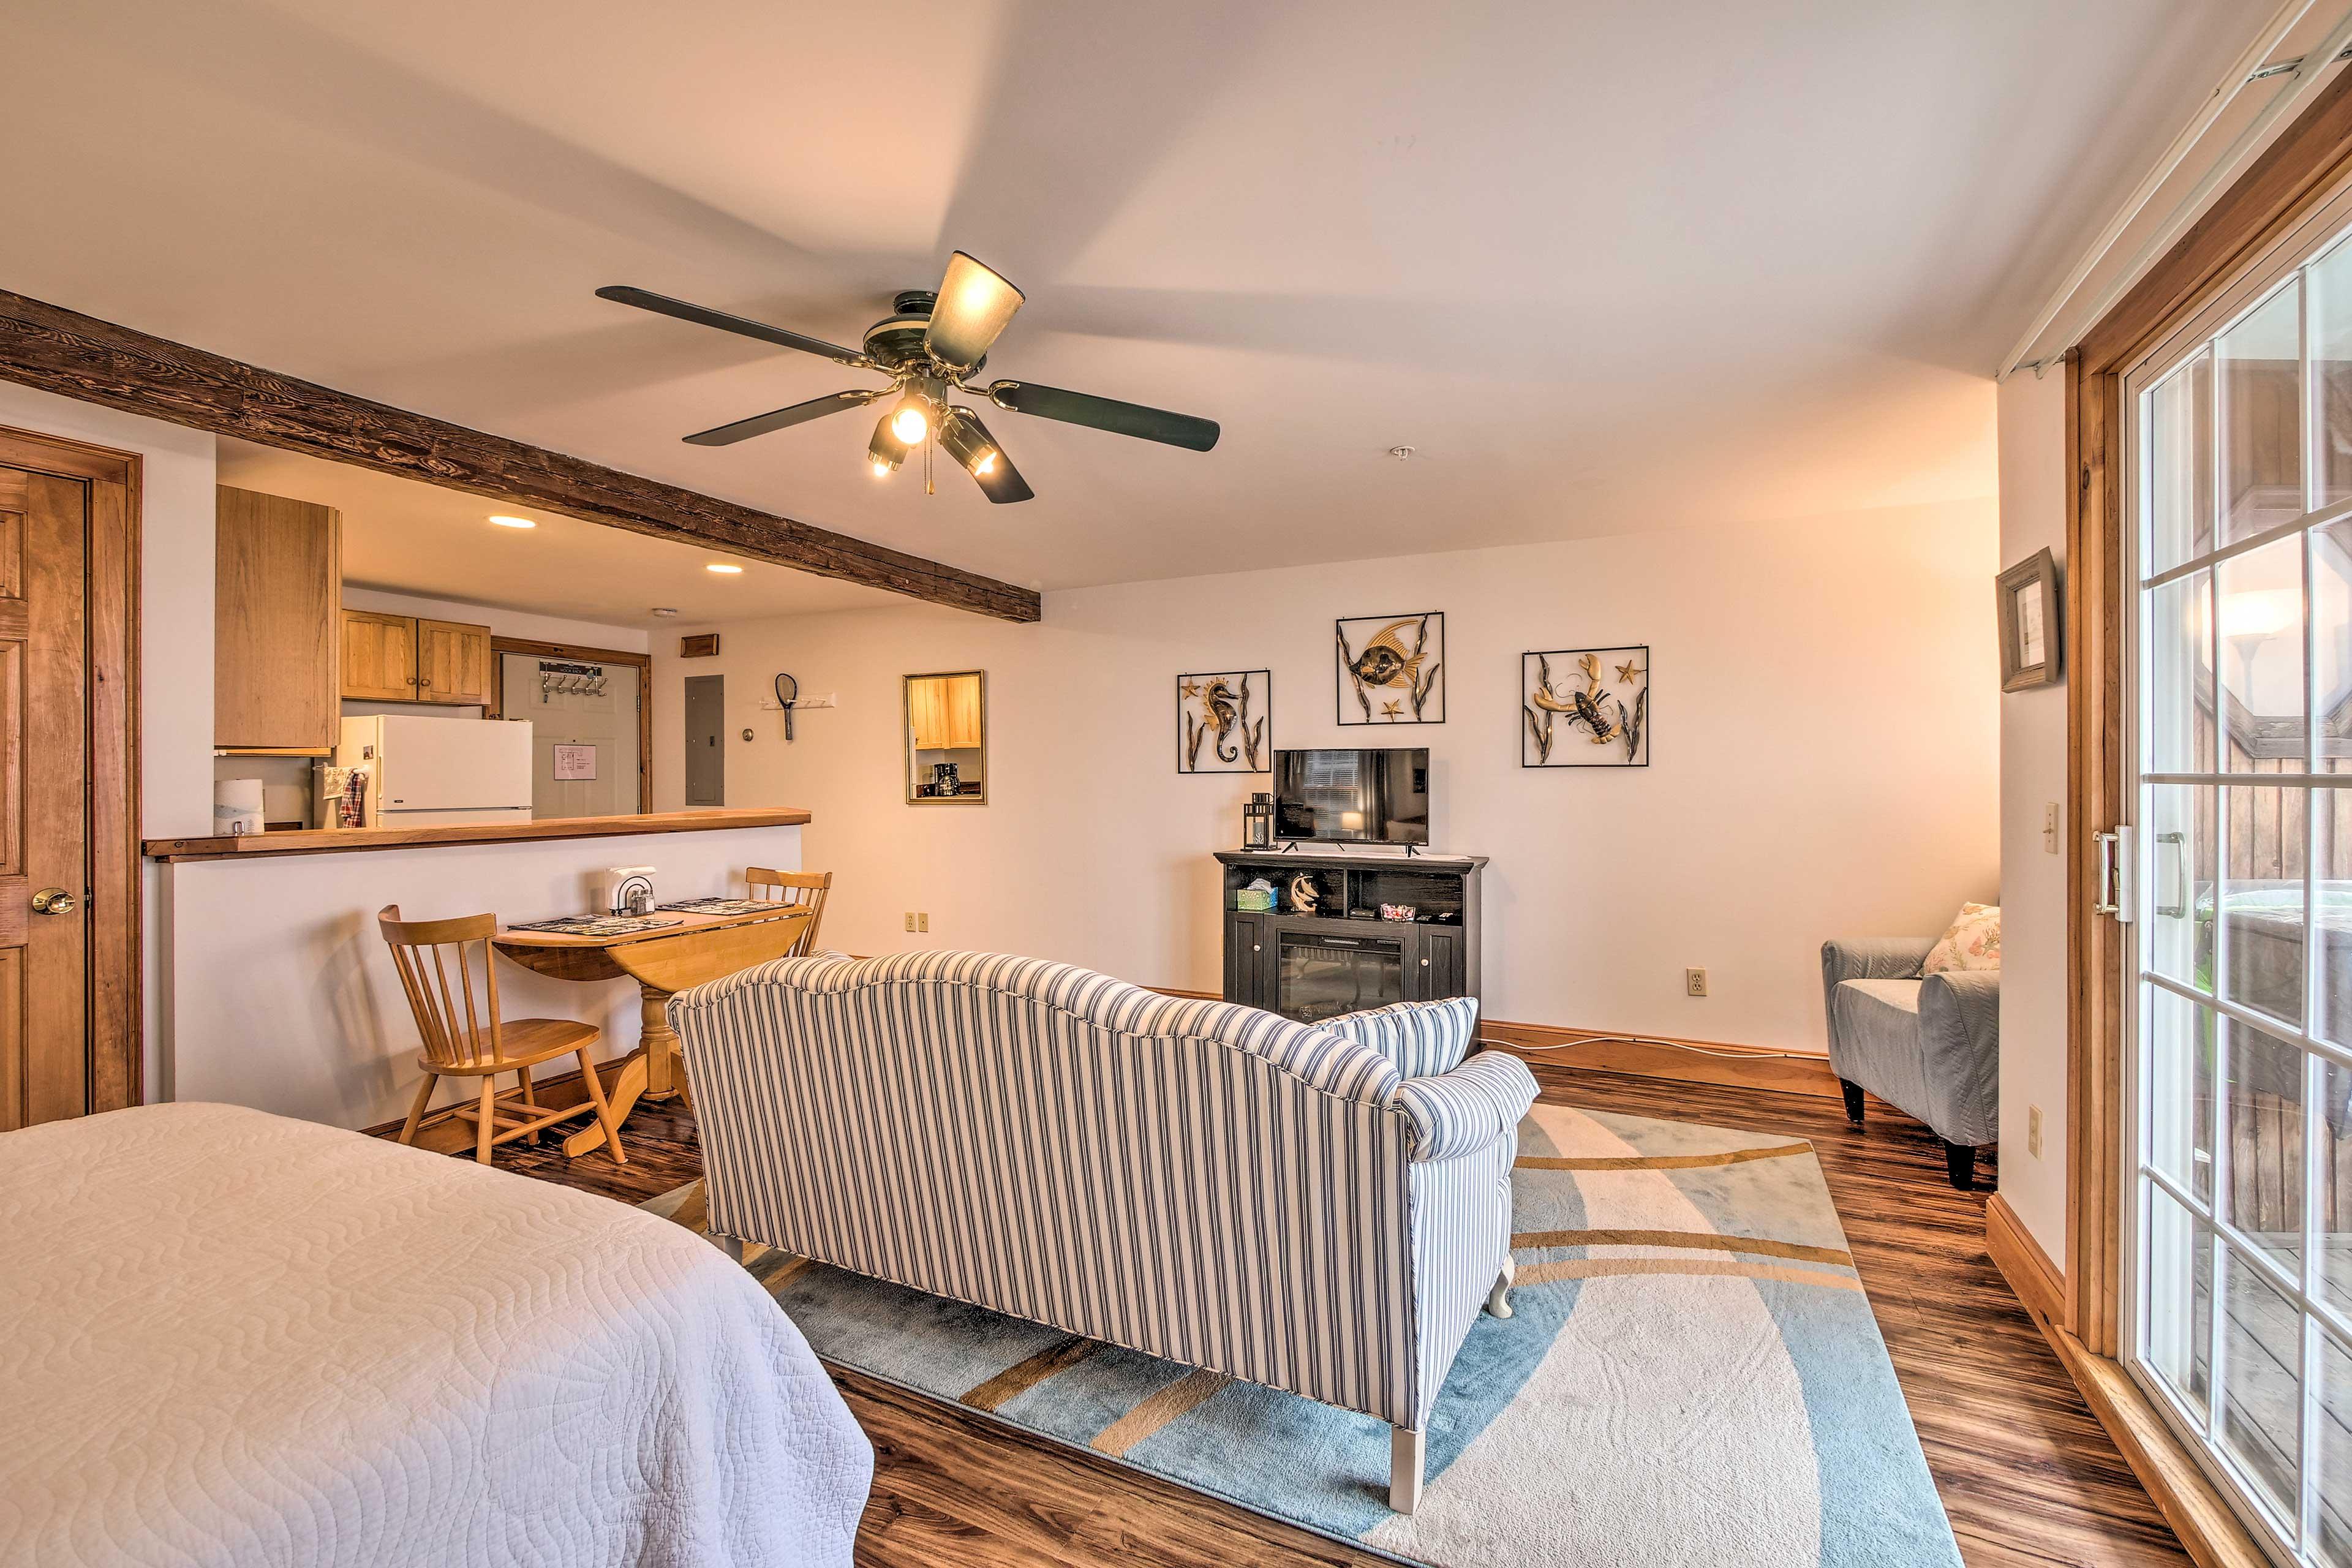 The open floor plan features exposed wood beams & tasteful decor.